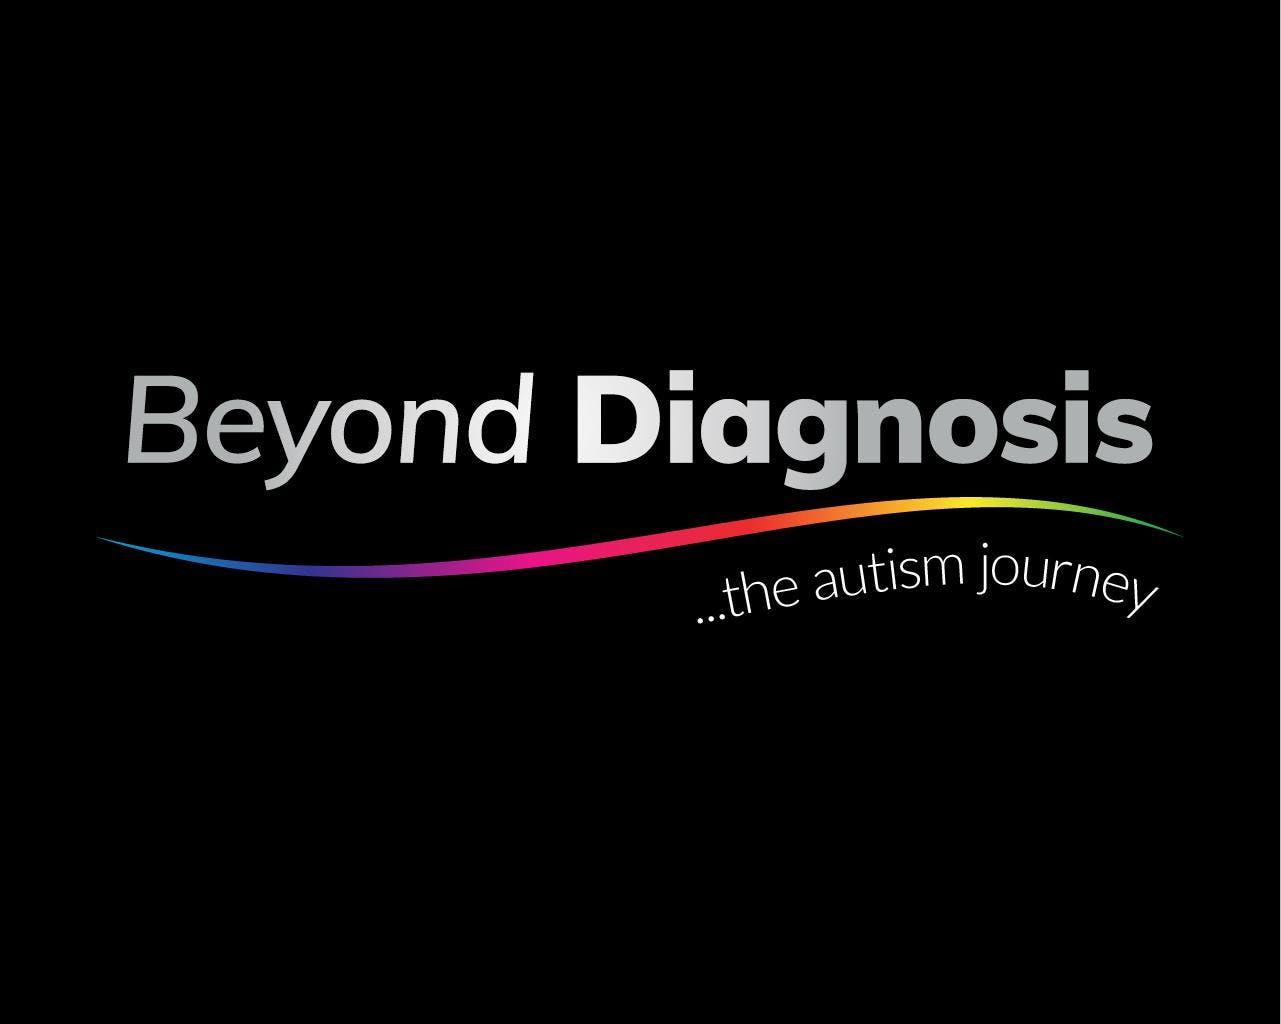 Autism Awareness Workshops